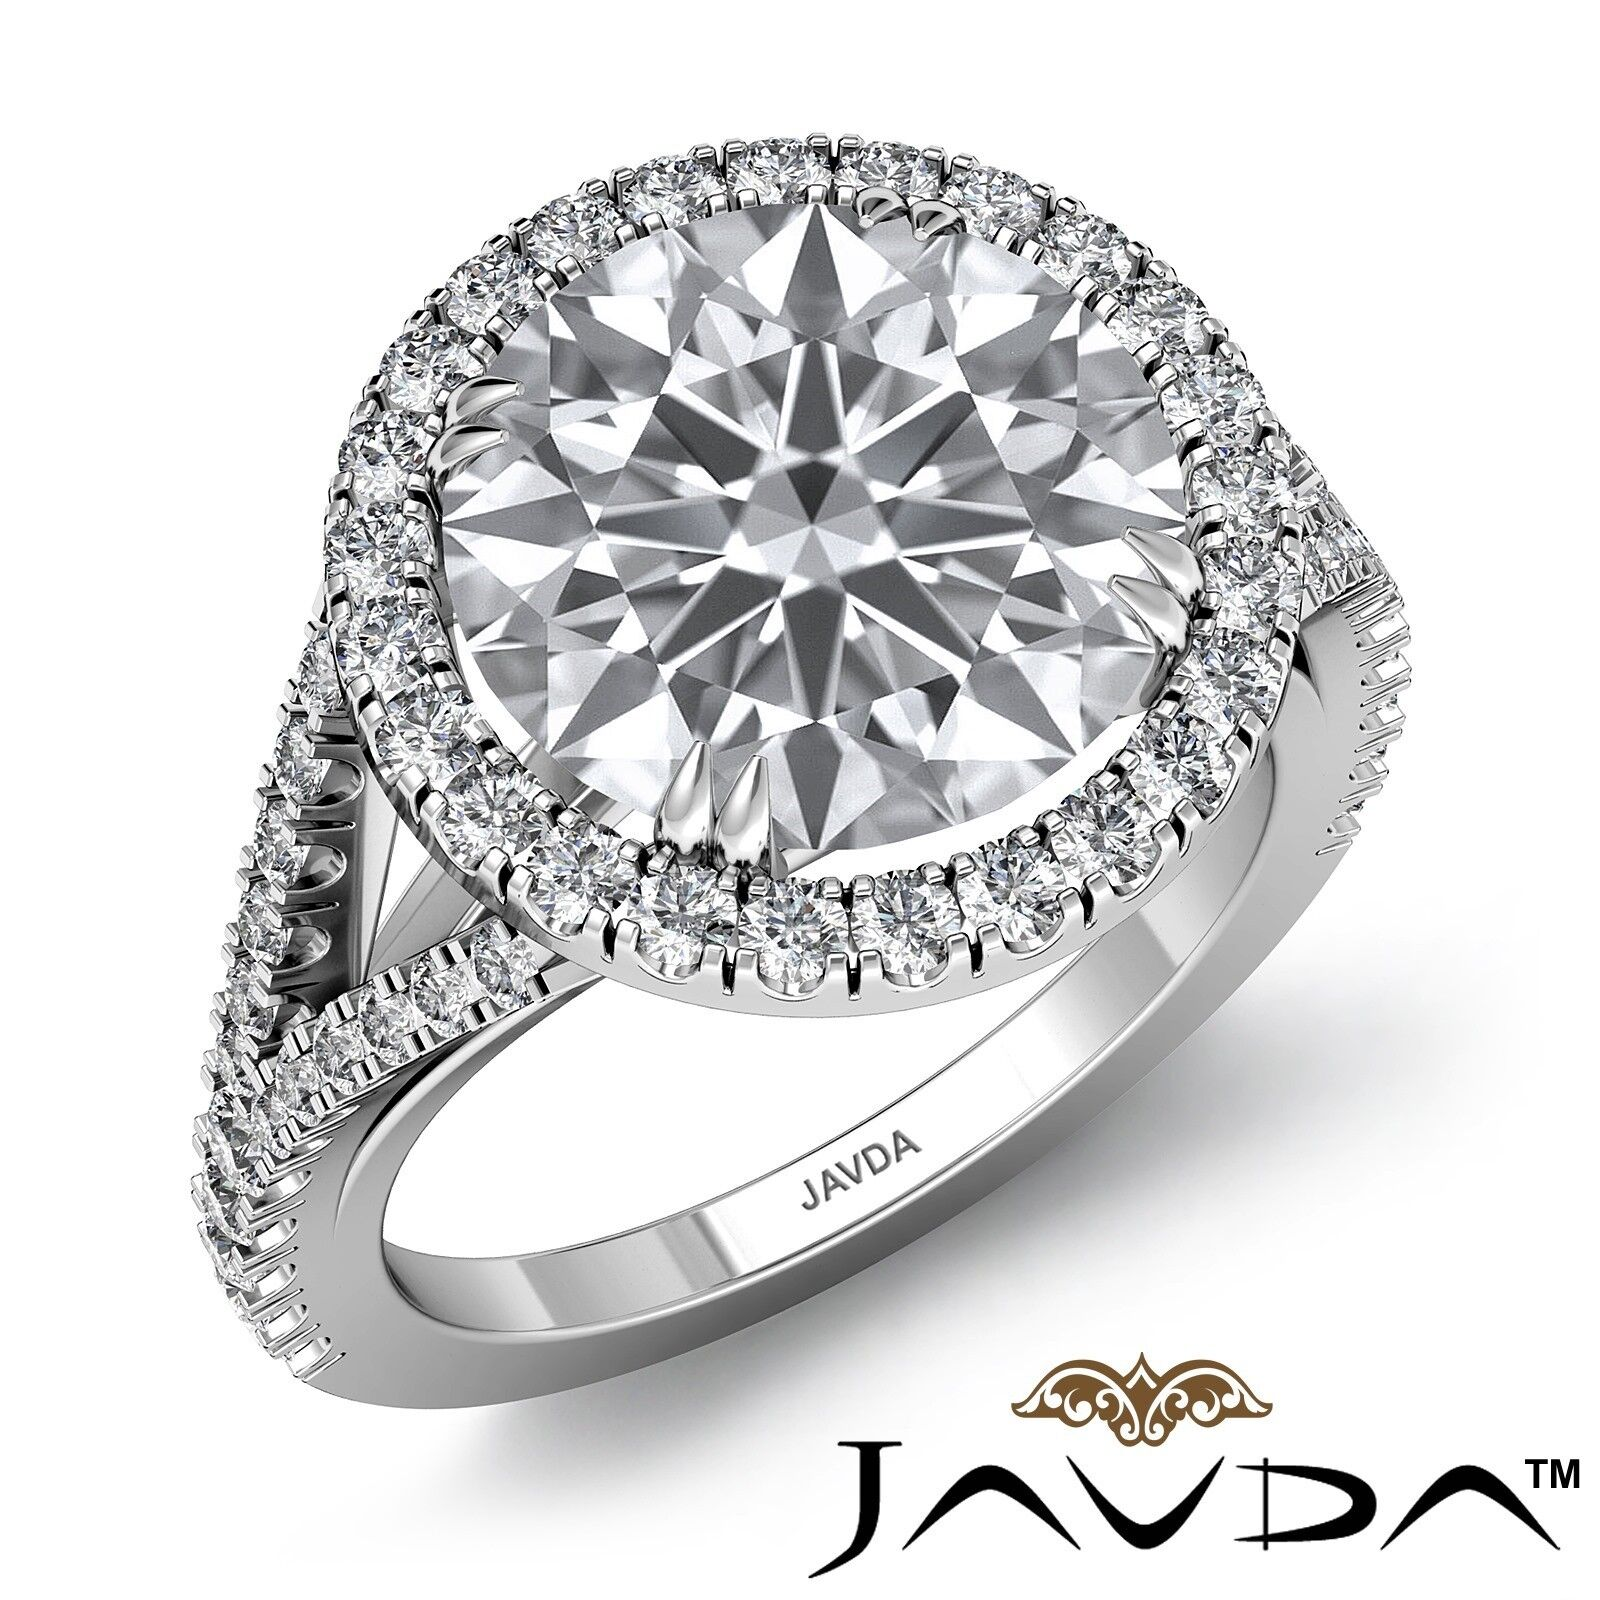 3.74ctw Double Prong Set Round Diamond Engagement Ring GIA H-VS2 Platinum Rings